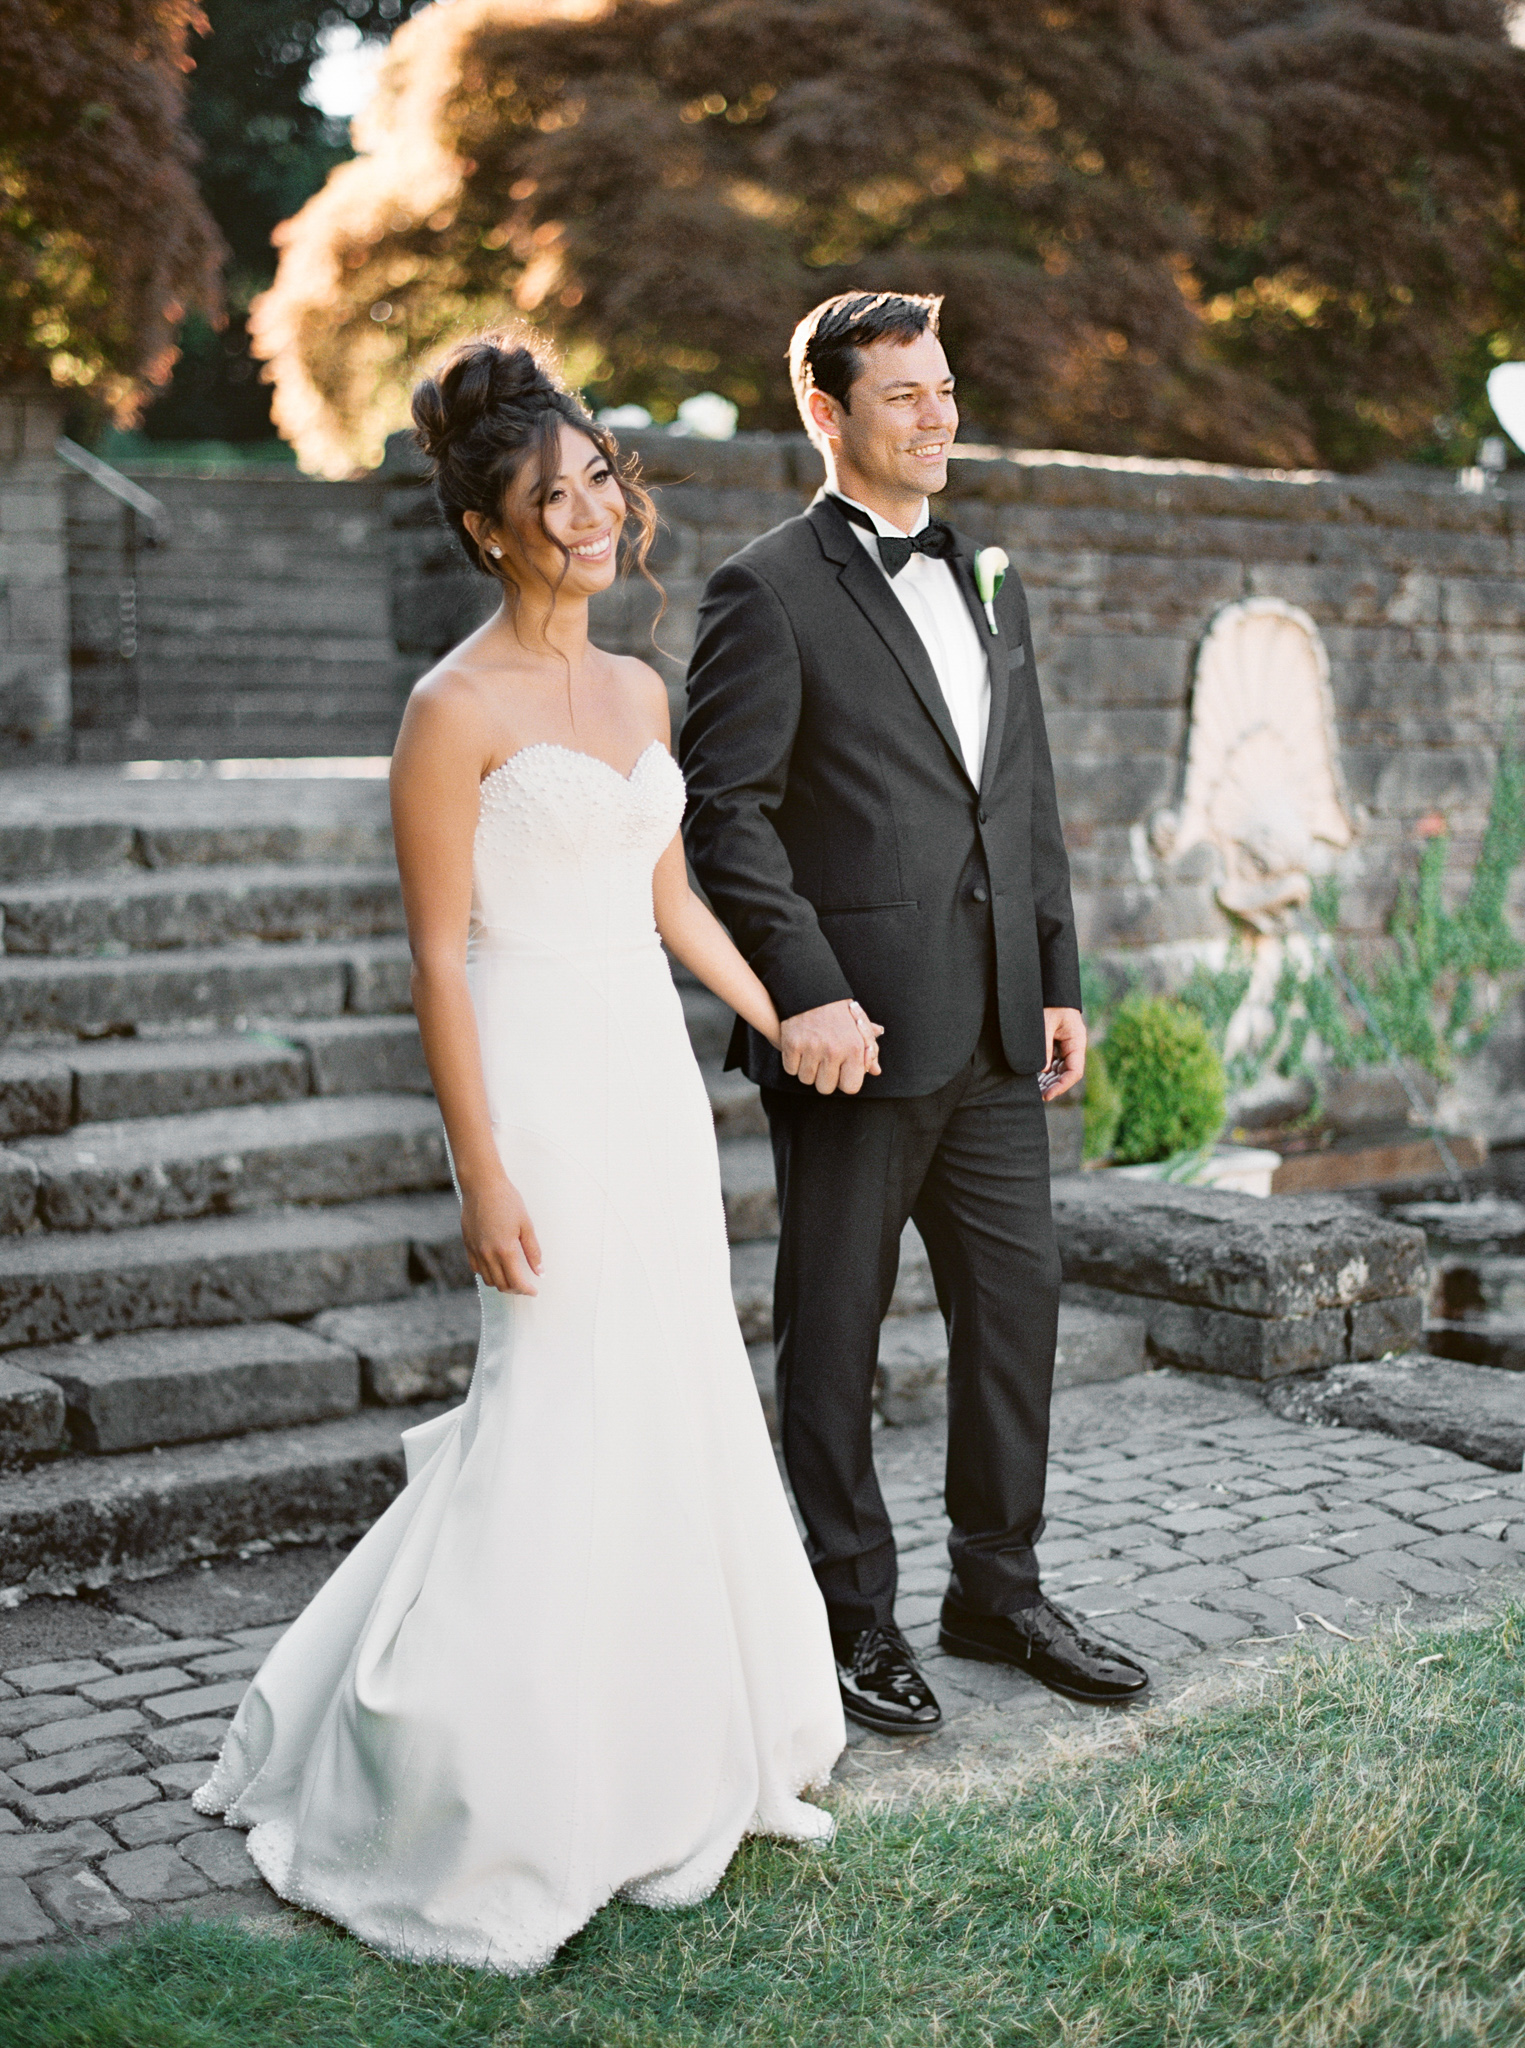 161OutliveCreative_Travel_Photographer_Videographer_Lewis&Clark_Oregon_Elegant_BlackTie_Destination_Wedding.jpg